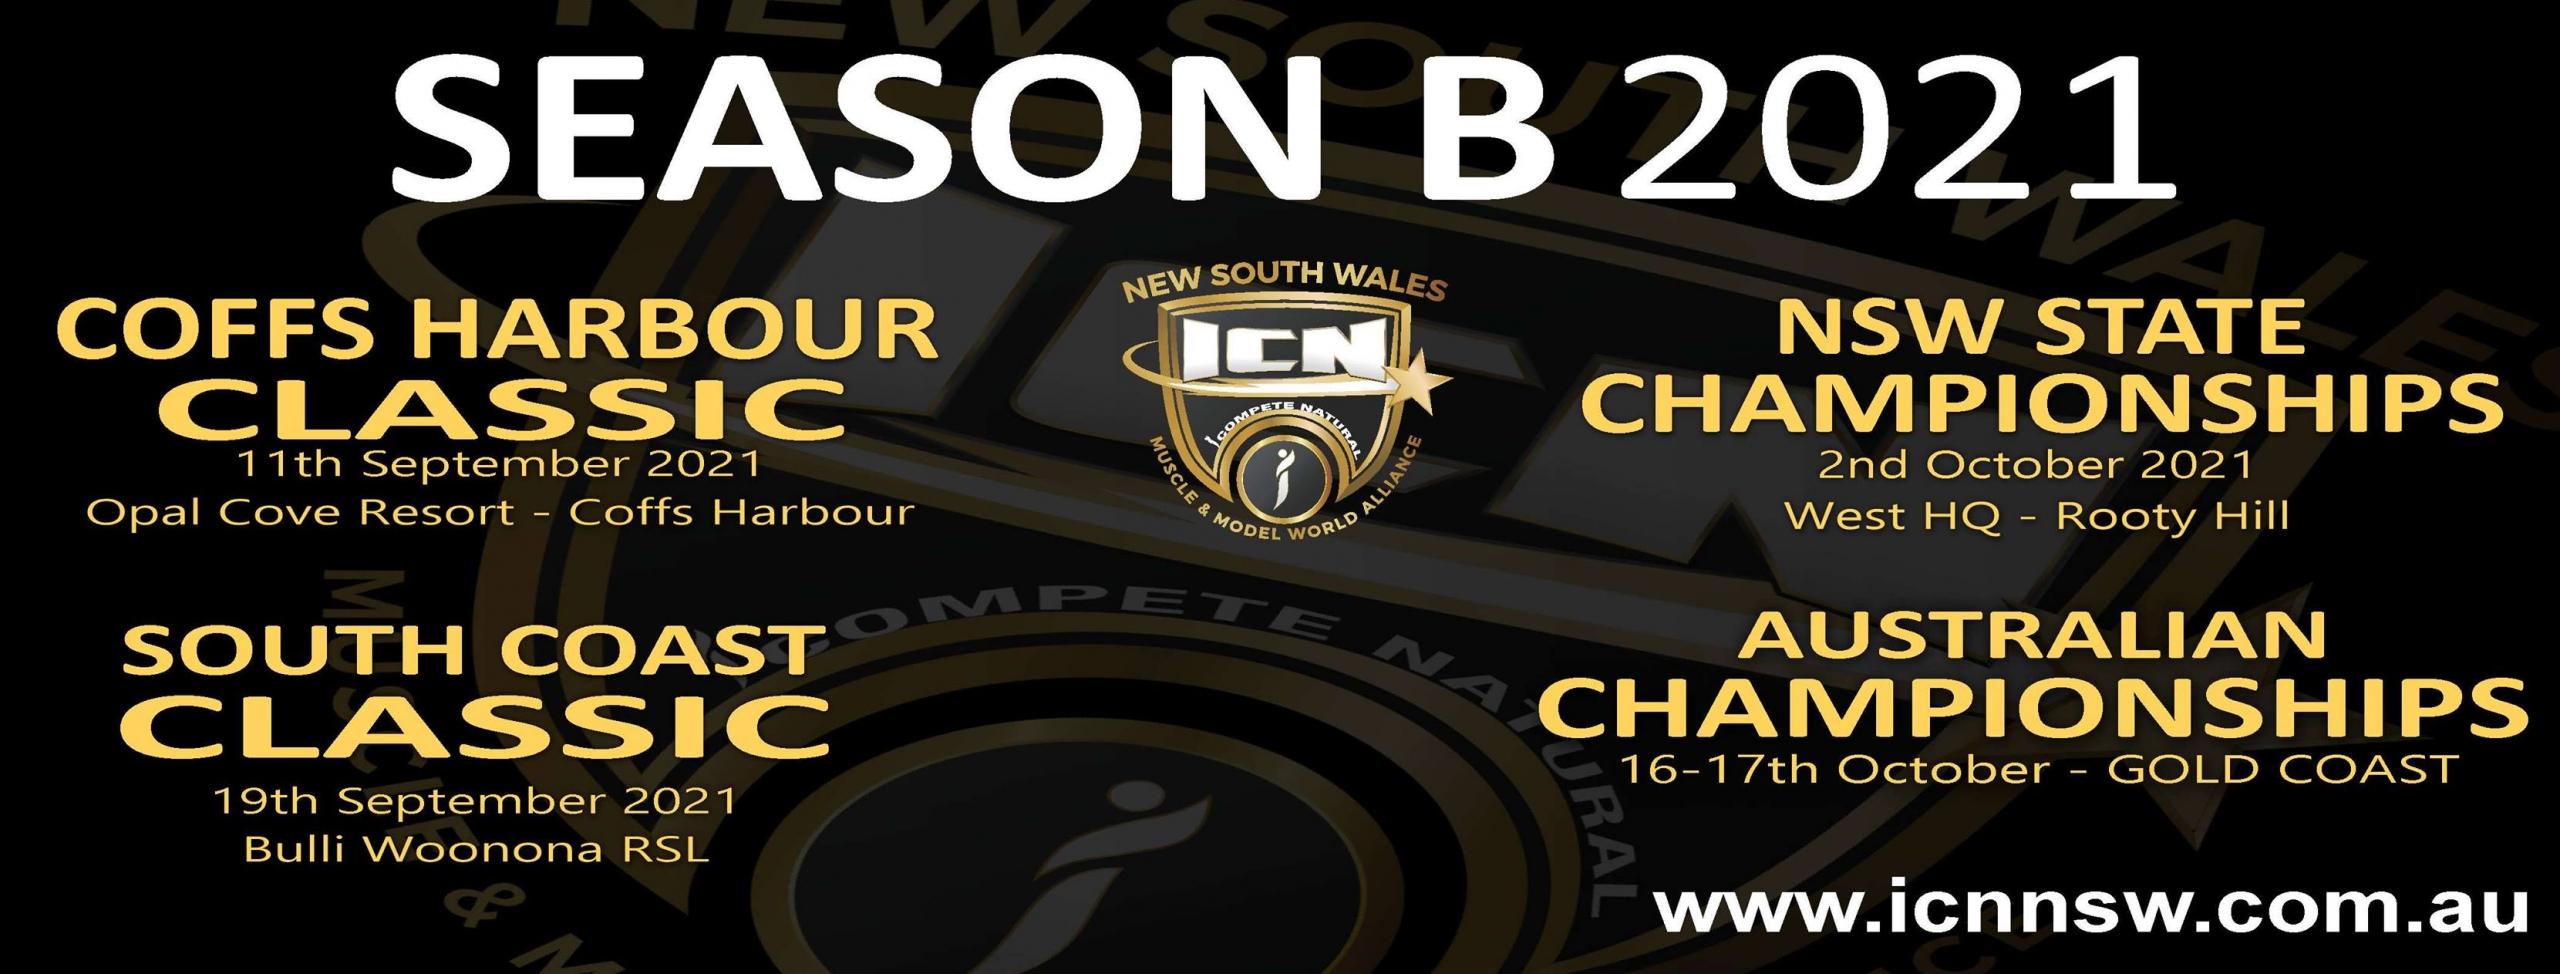 ICN Season B 2021